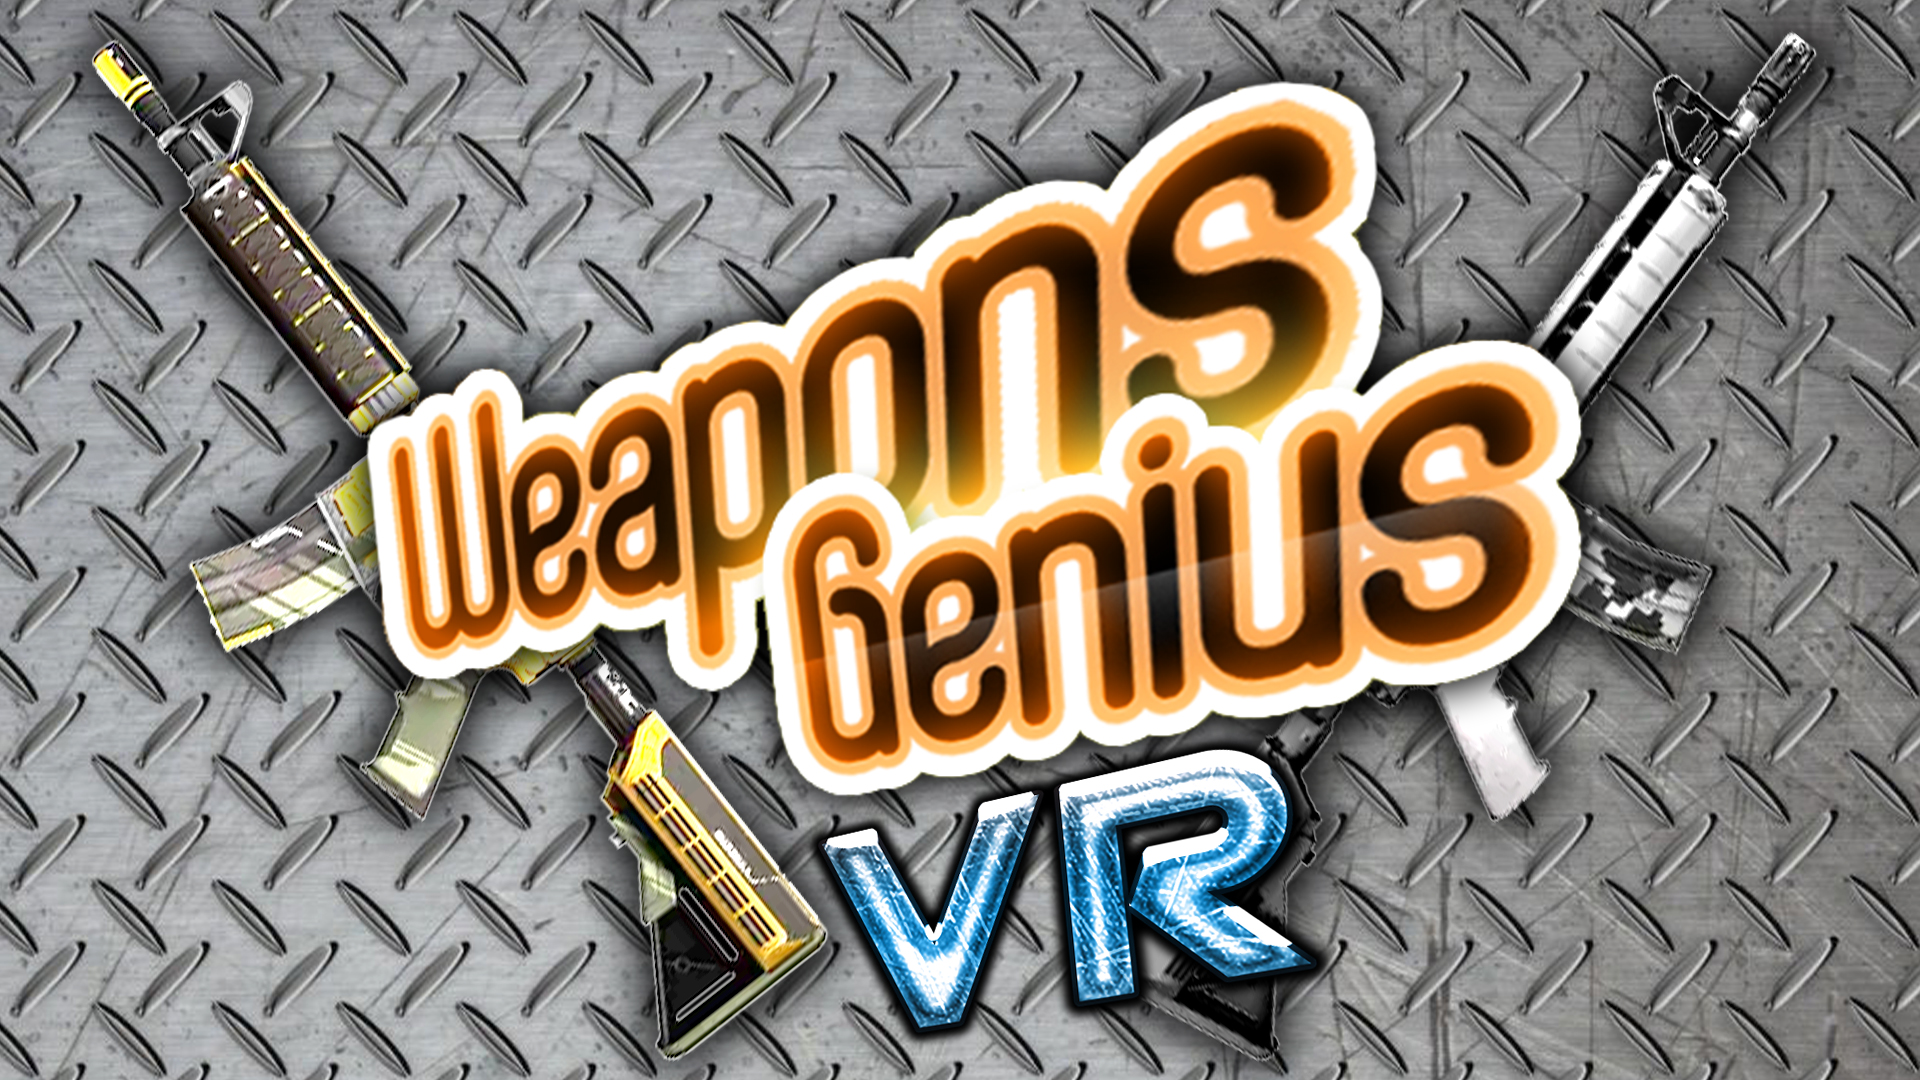 Weapons Genius VR  192